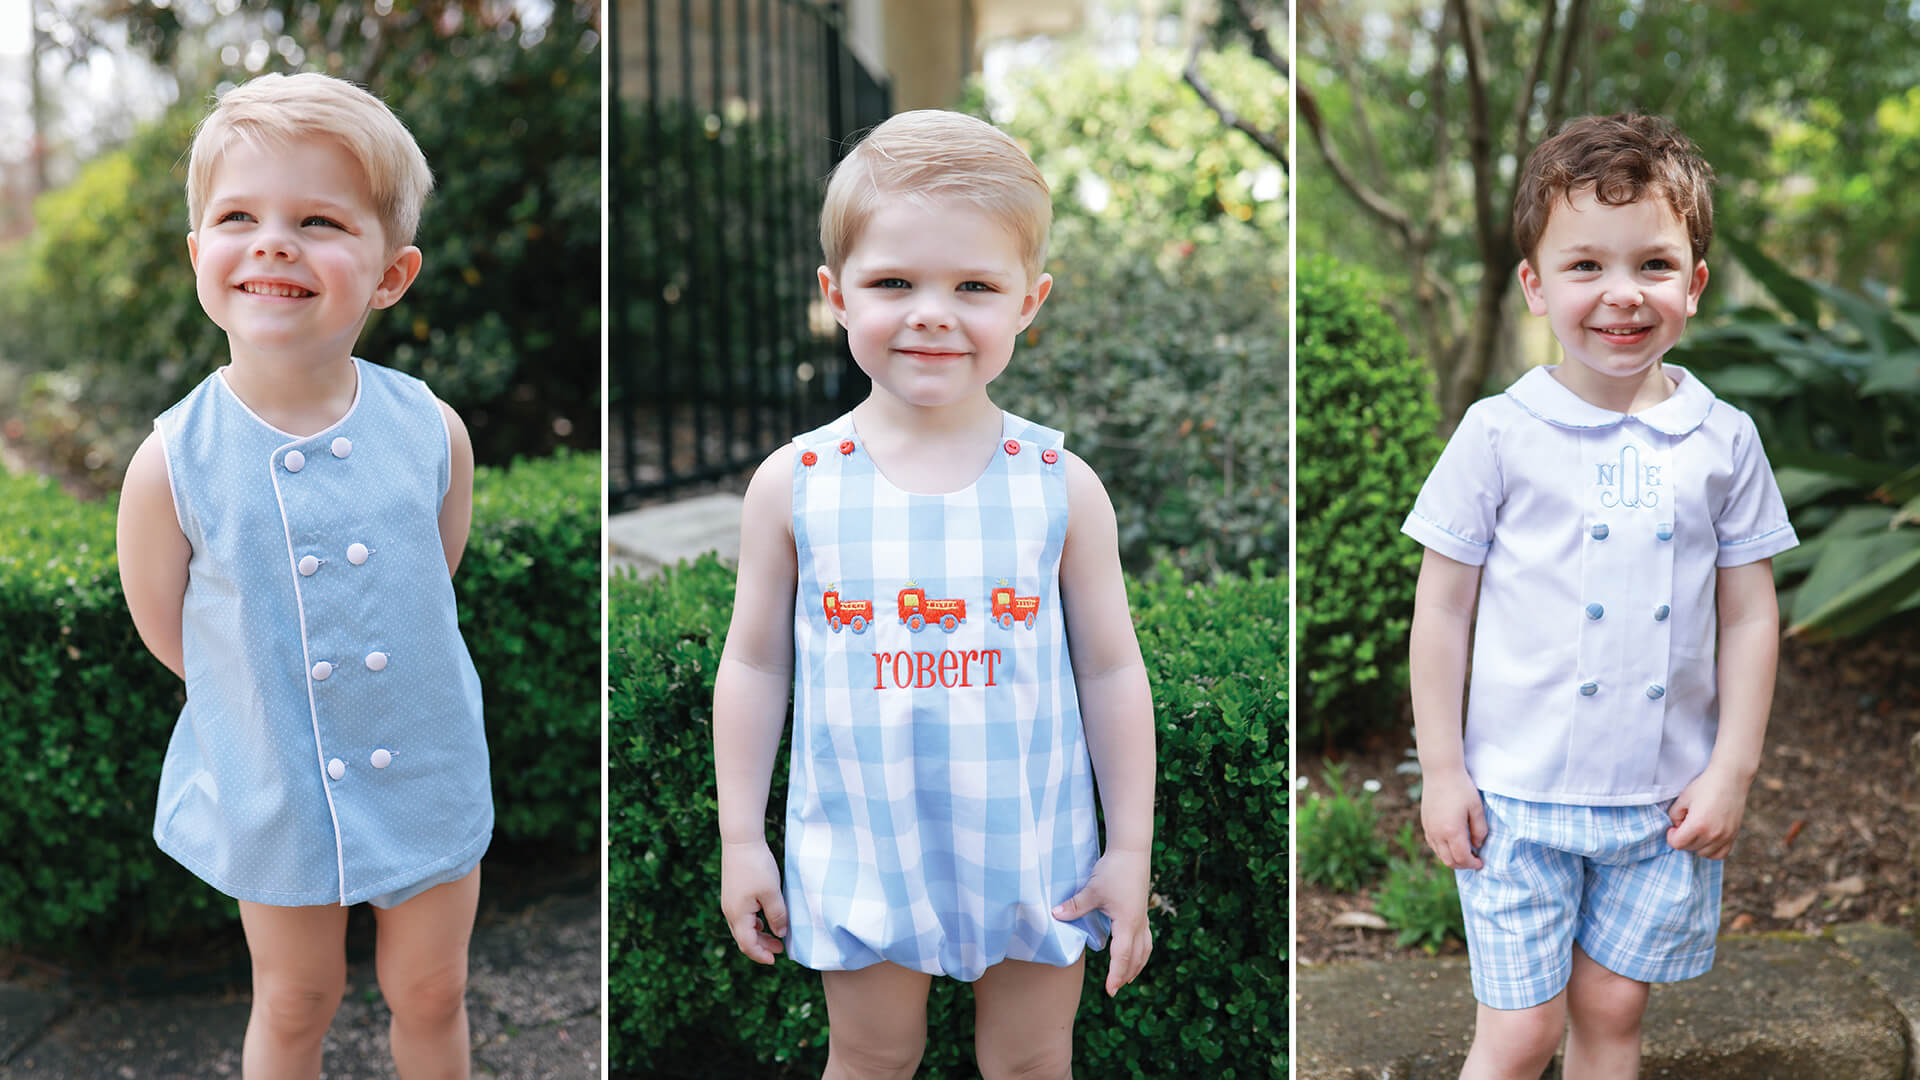 Boy's Spring Clothing - Boy's Summer Clothing